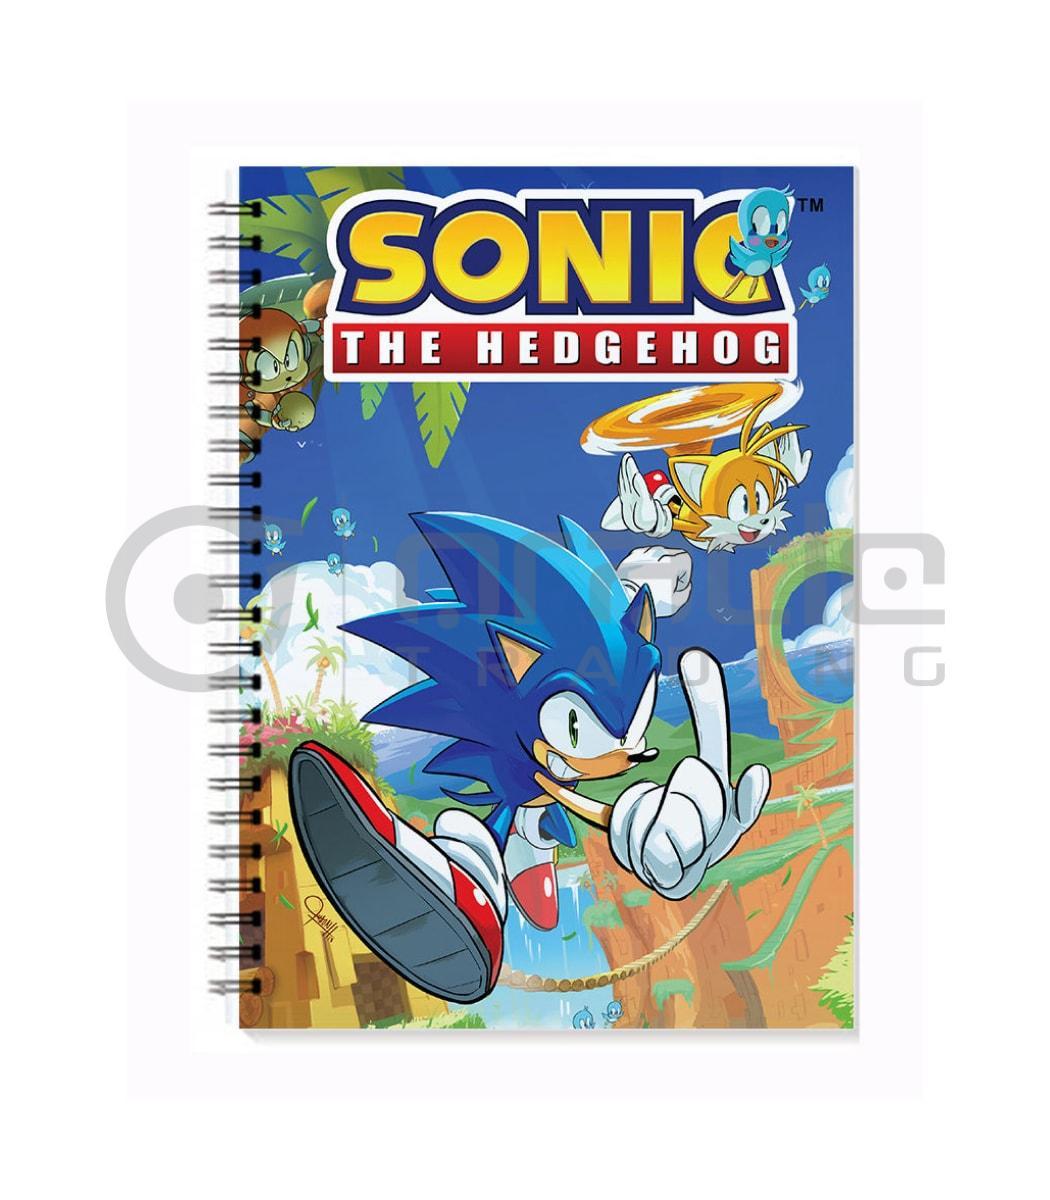 Sonic the Hedgehog Notebook - Sega